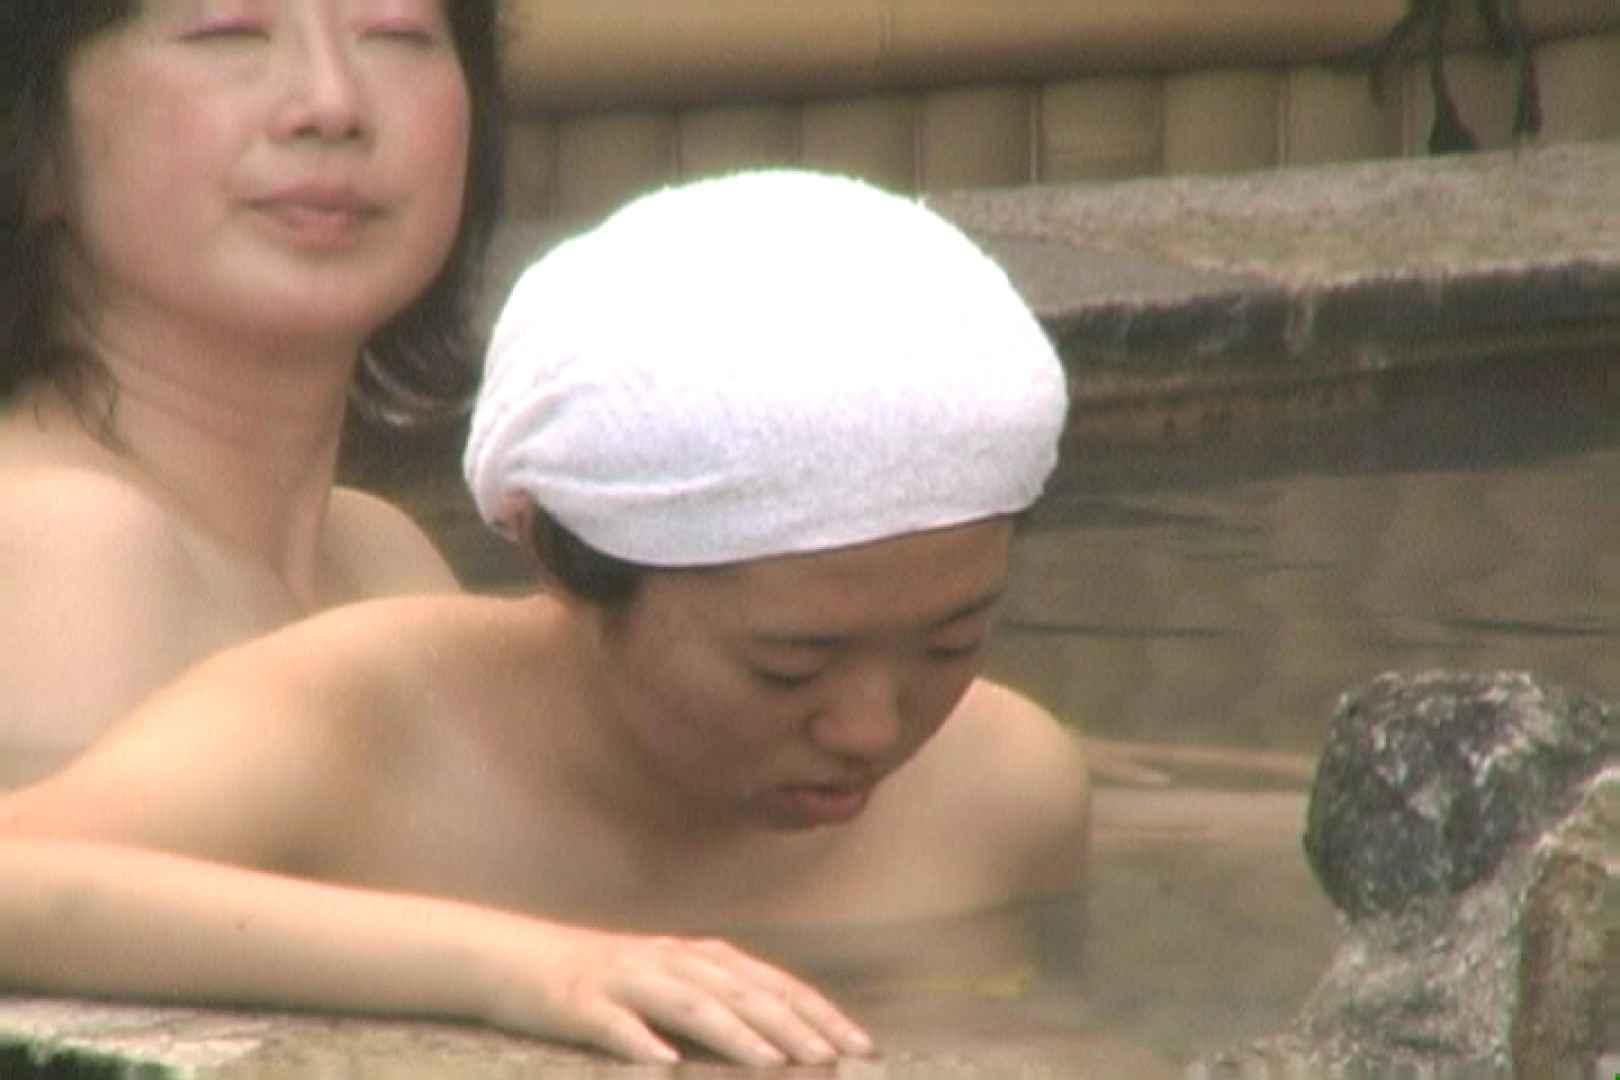 Aquaな露天風呂Vol.627 OLセックス 盗撮オメコ無修正動画無料 55画像 17